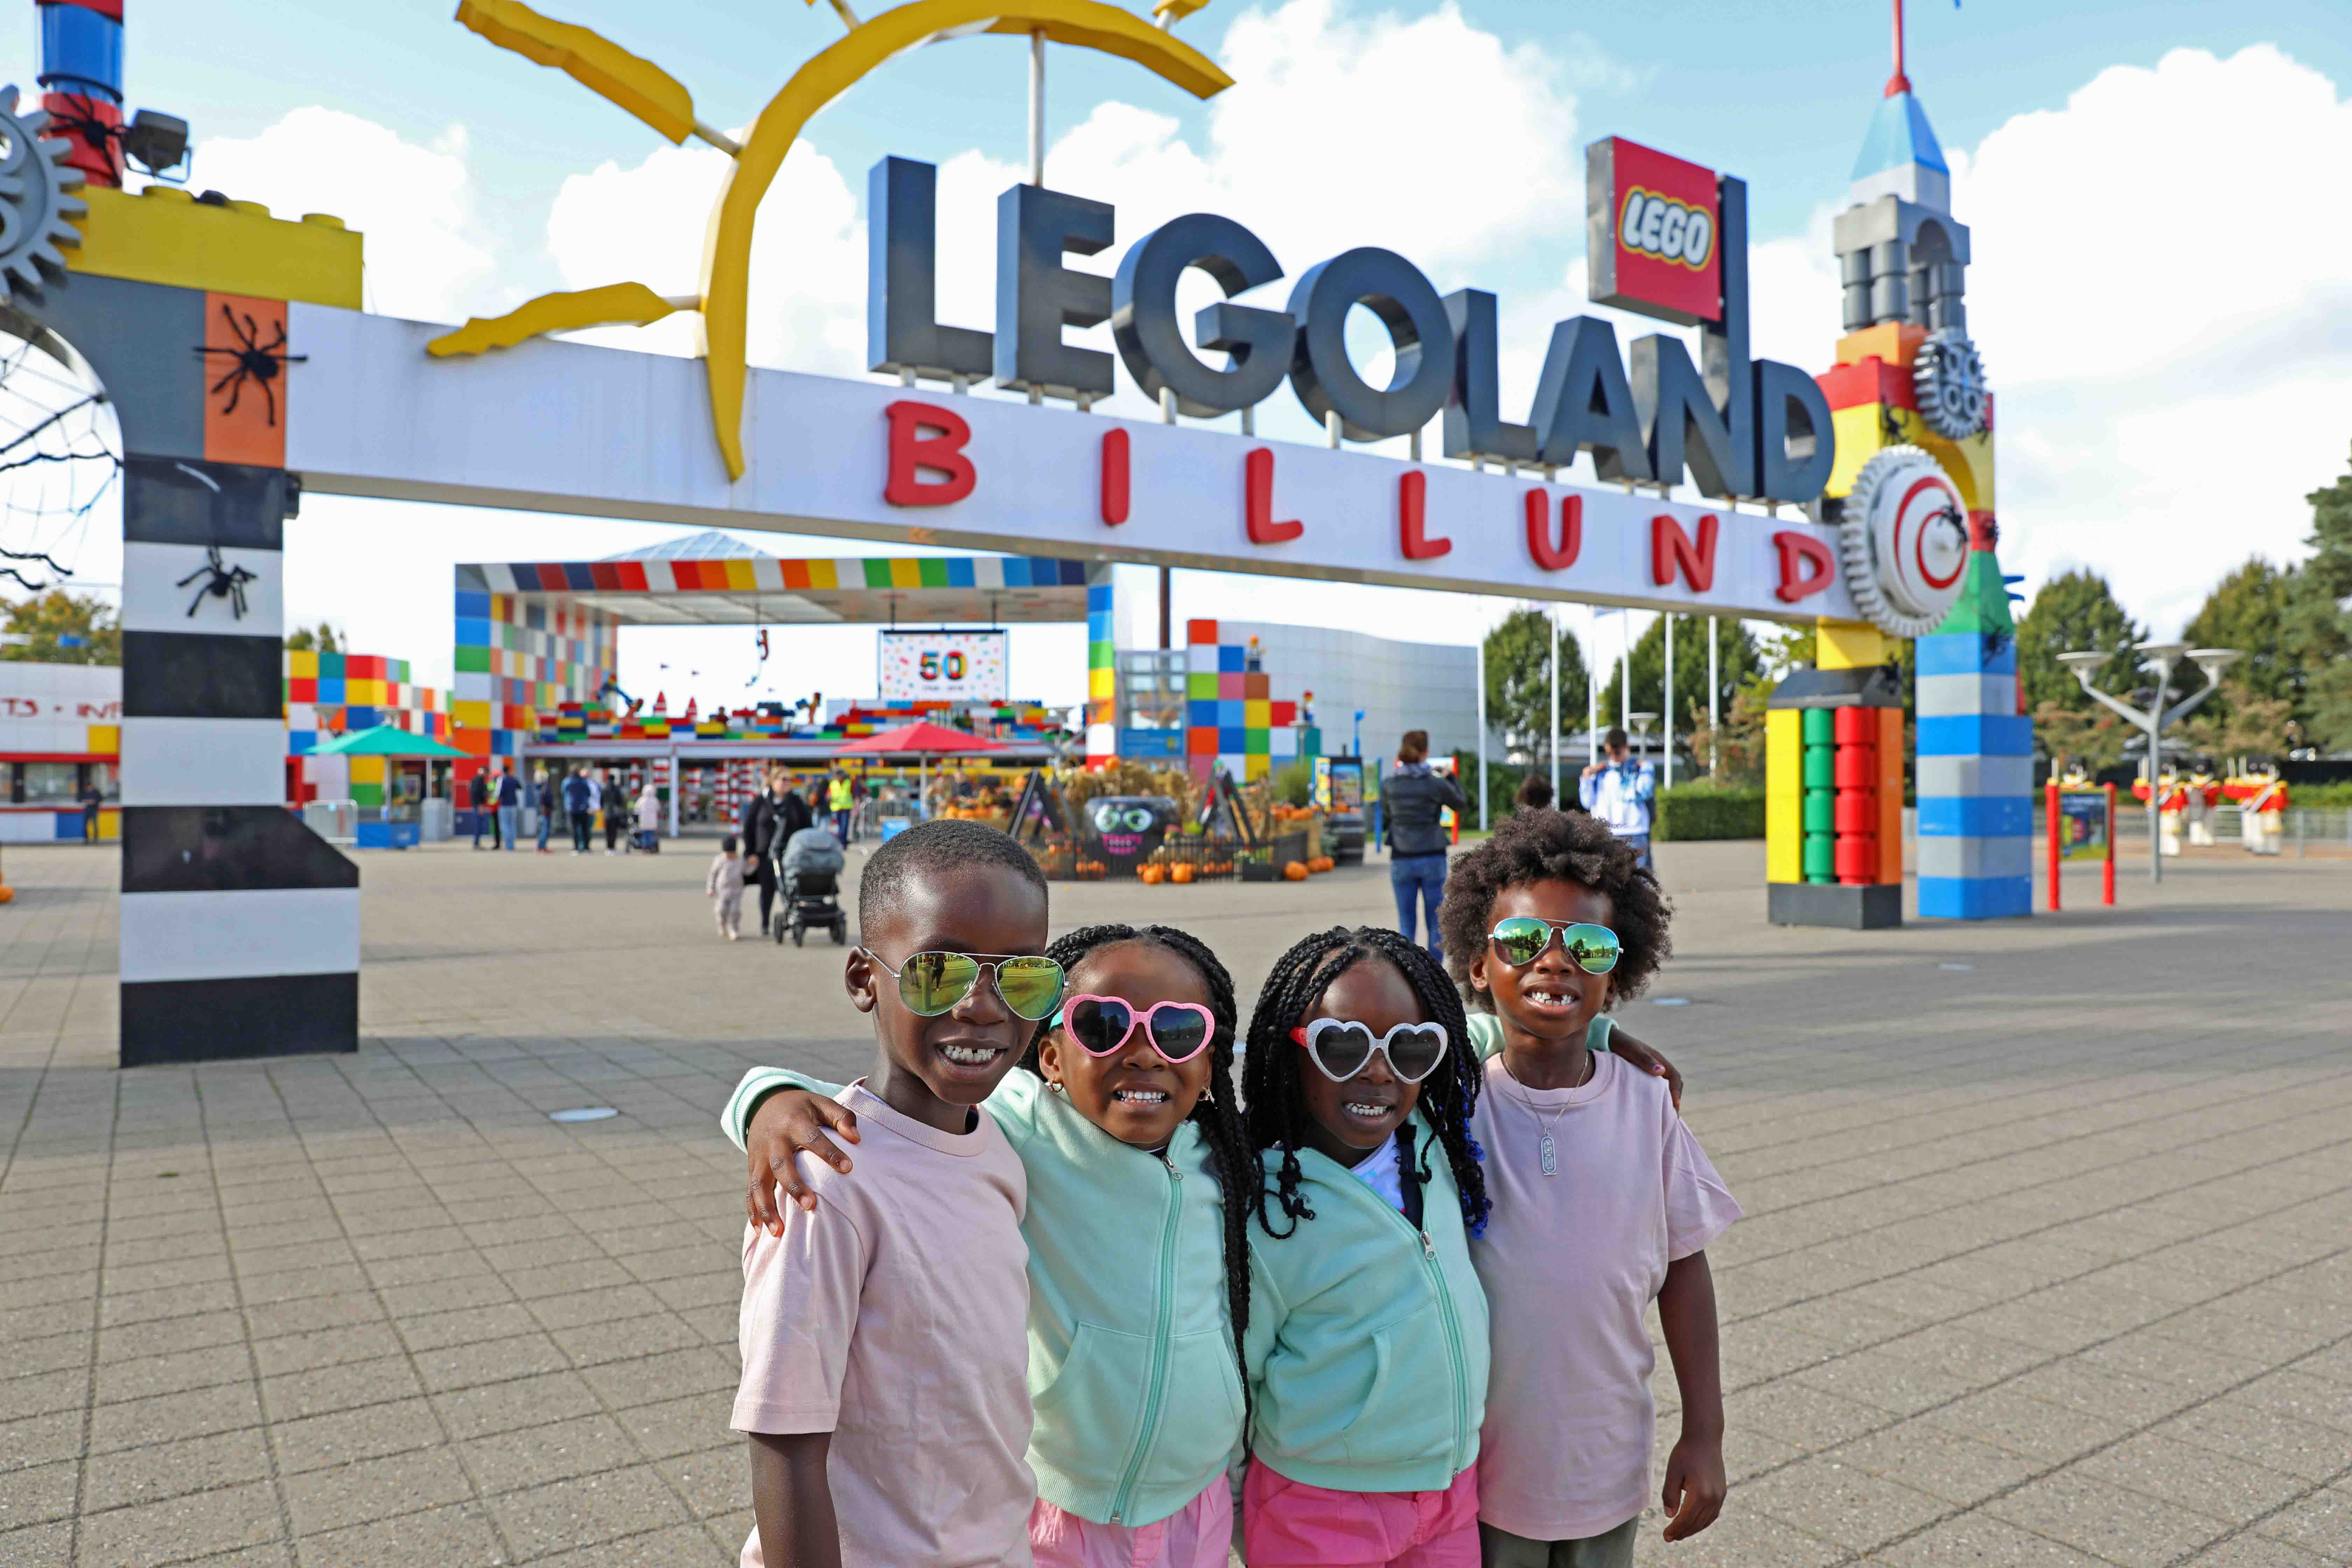 Billund Denmark With Kids: The Original Legoland Theme ...